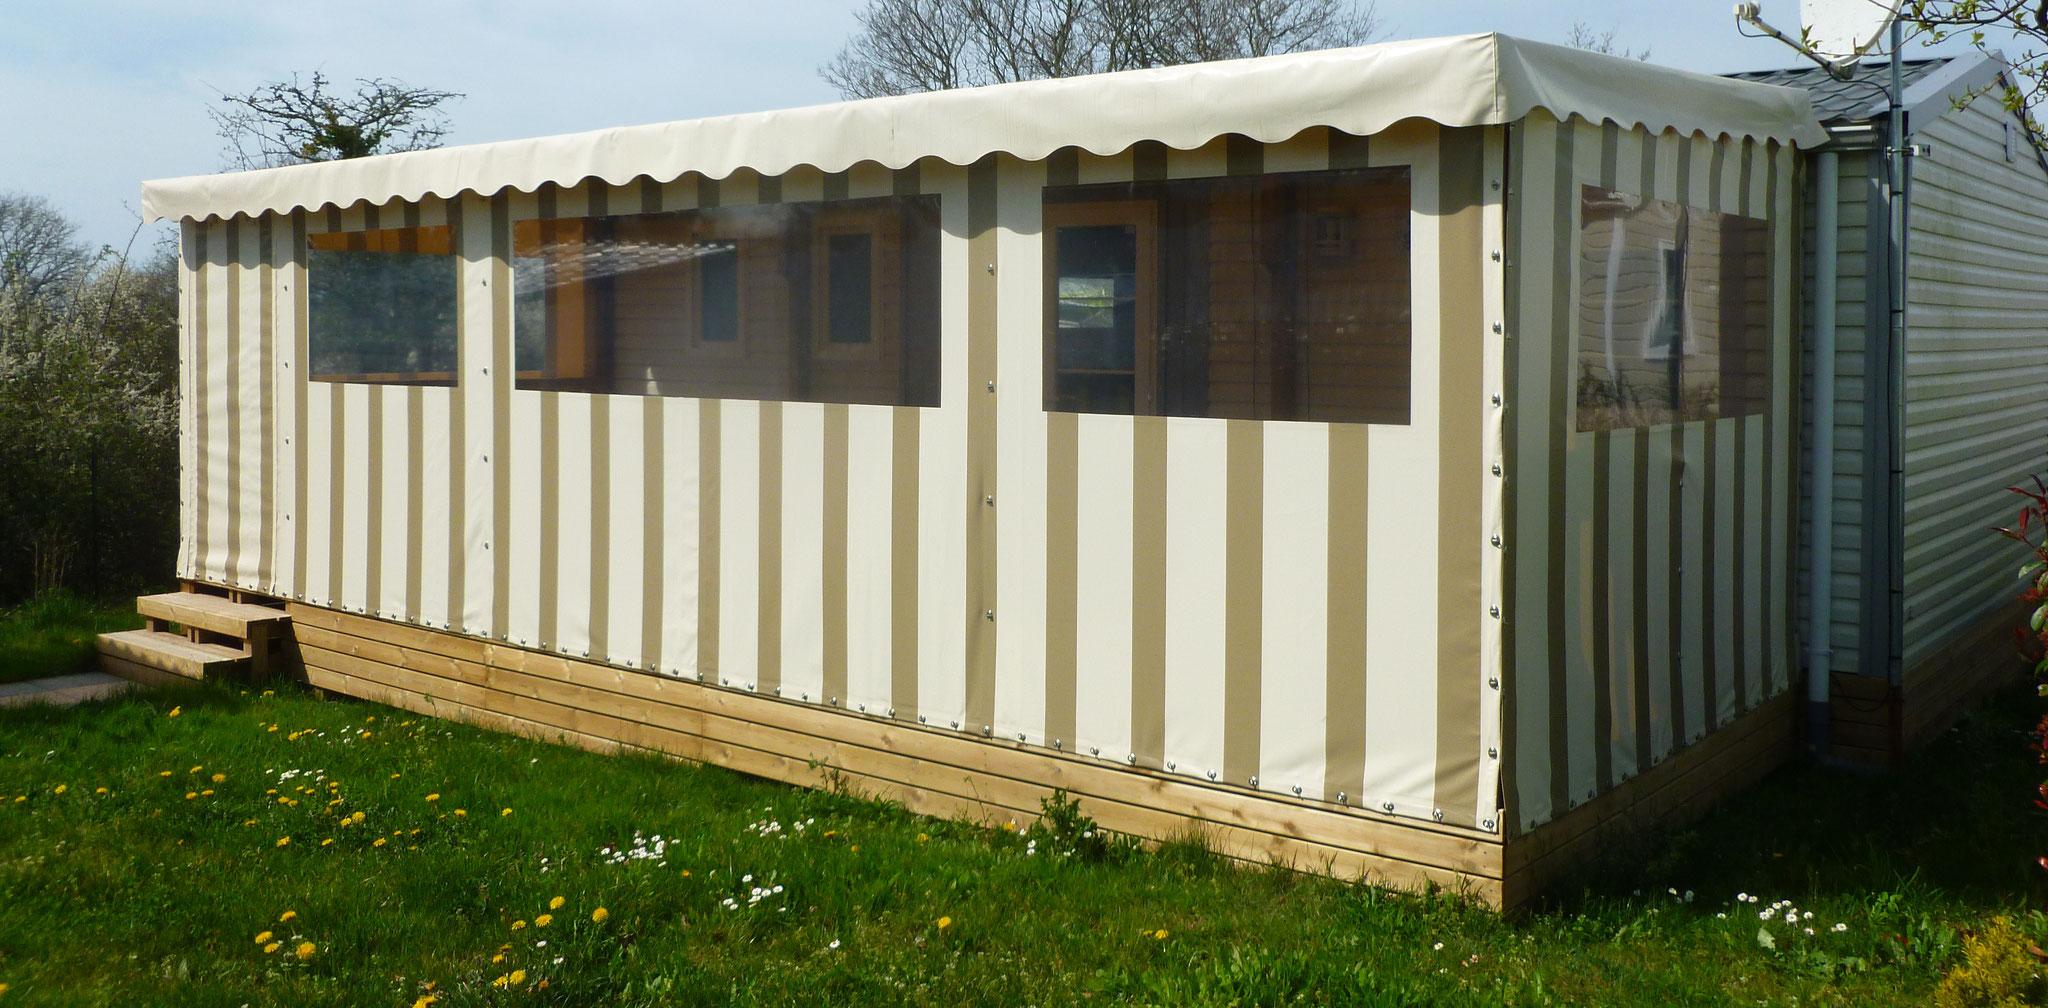 Terrasse mobil home couverte, baches sur mesure